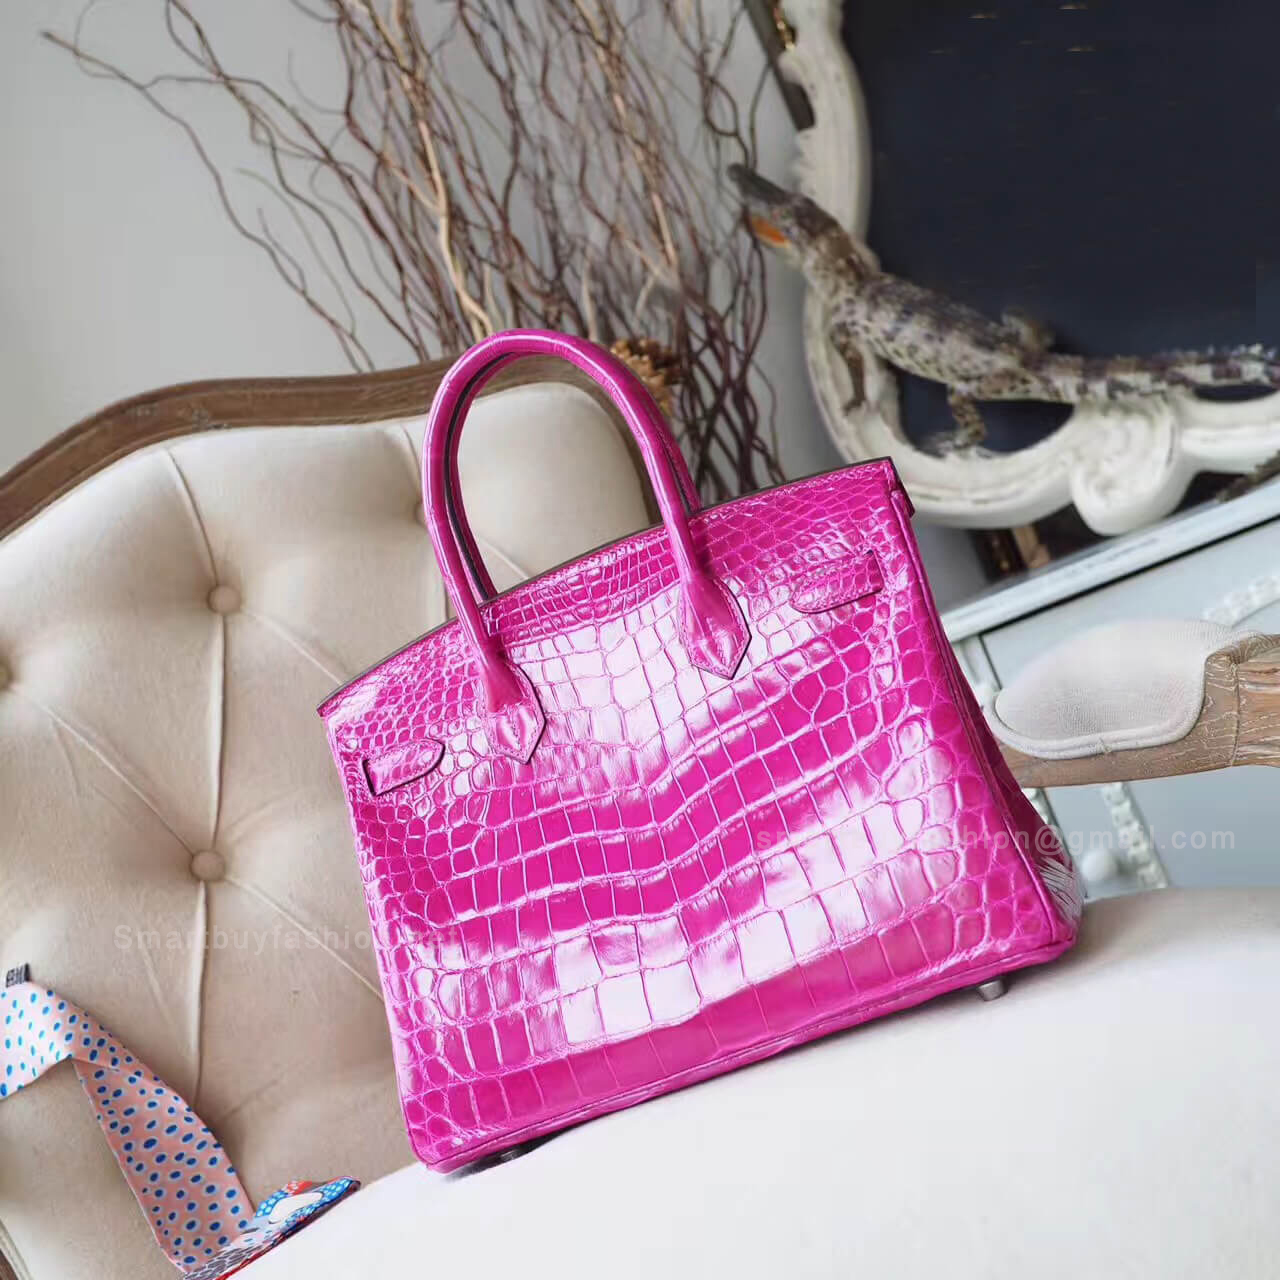 ff5dda819d1 Hermes Birkin 30 Bag in Rose Scheherazade Shiny Nile Croc PHW - Hermes  Replica